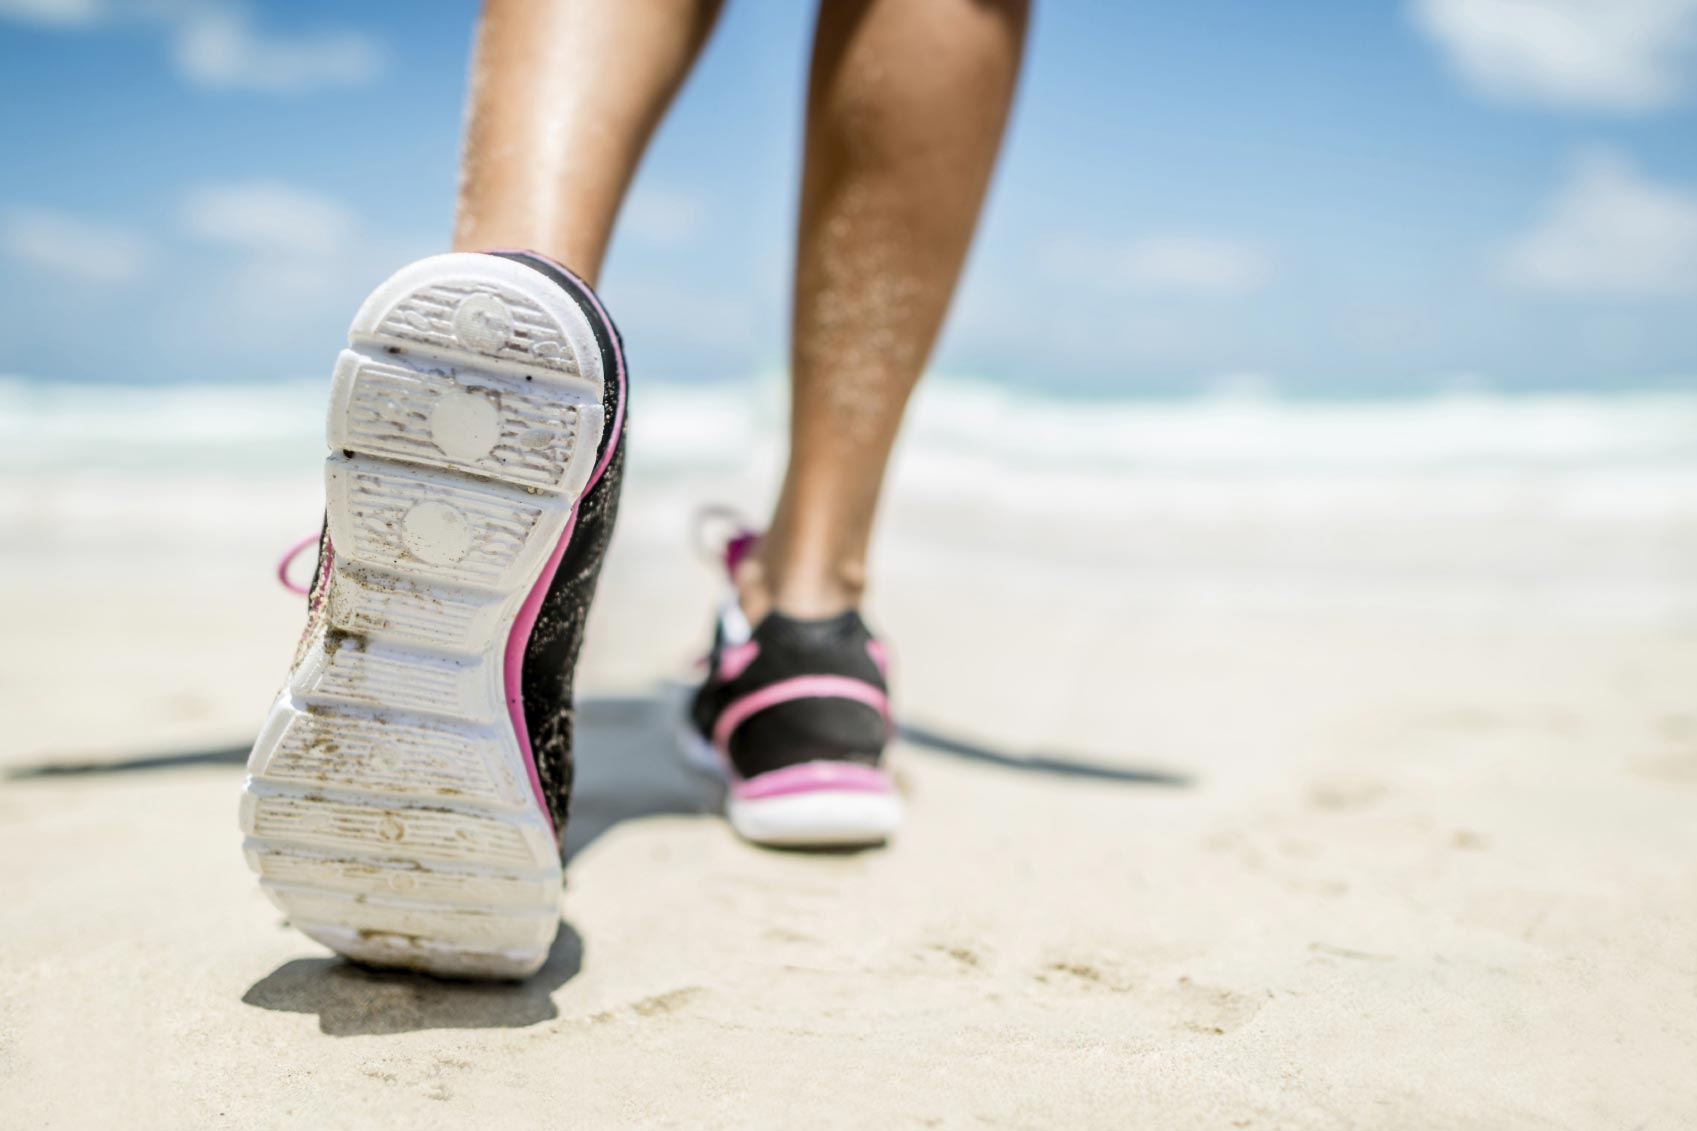 Am Strand joggen gehen